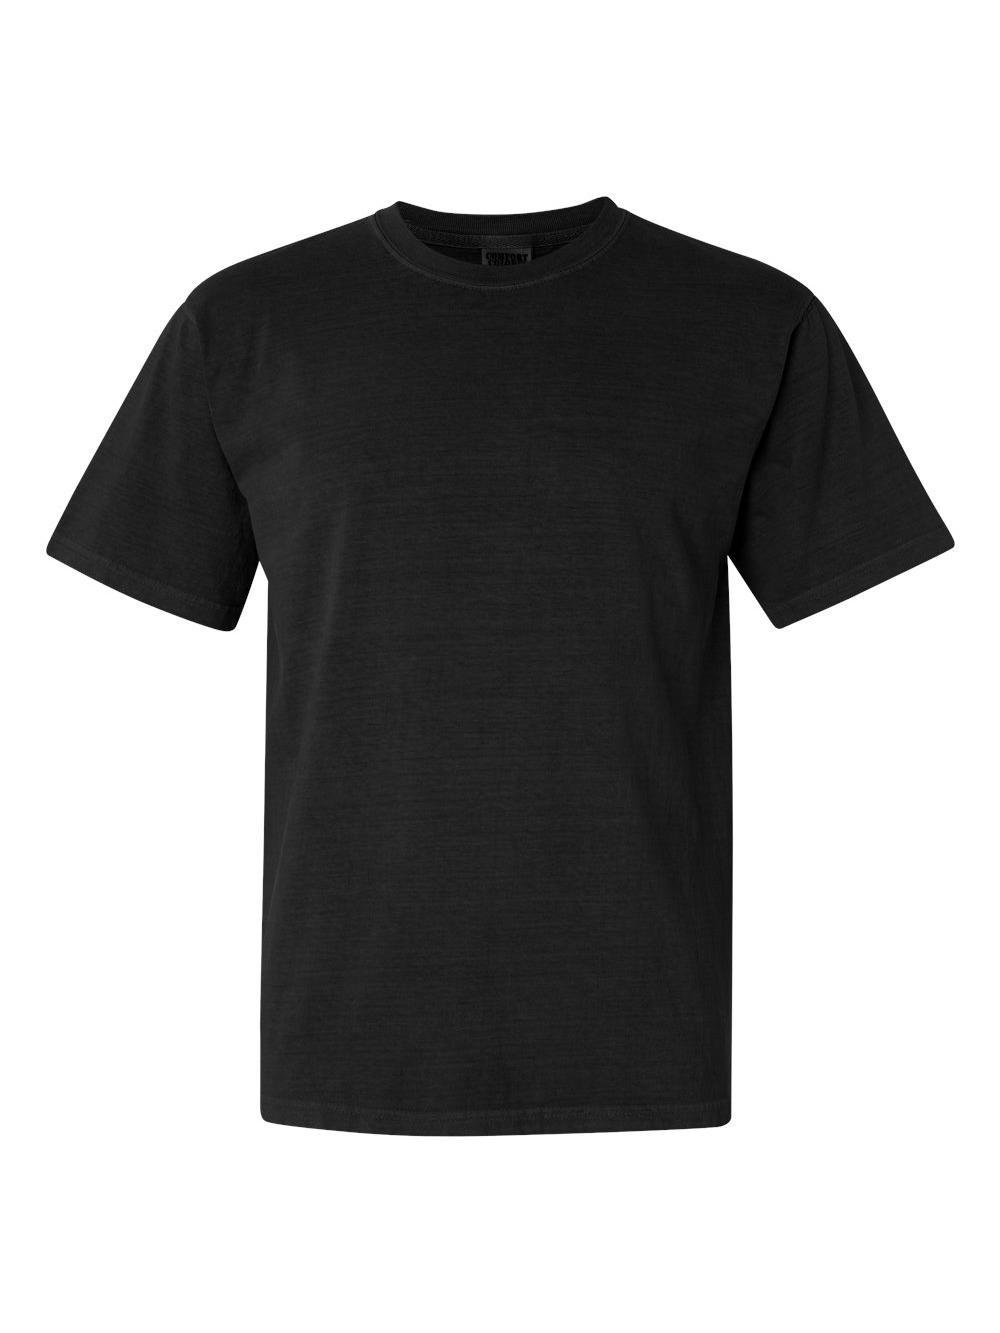 Comfort-Colors-Garment-Dyed-Heavyweight-Ringspun-Short-Sleeve-Shirt-1717 thumbnail 9